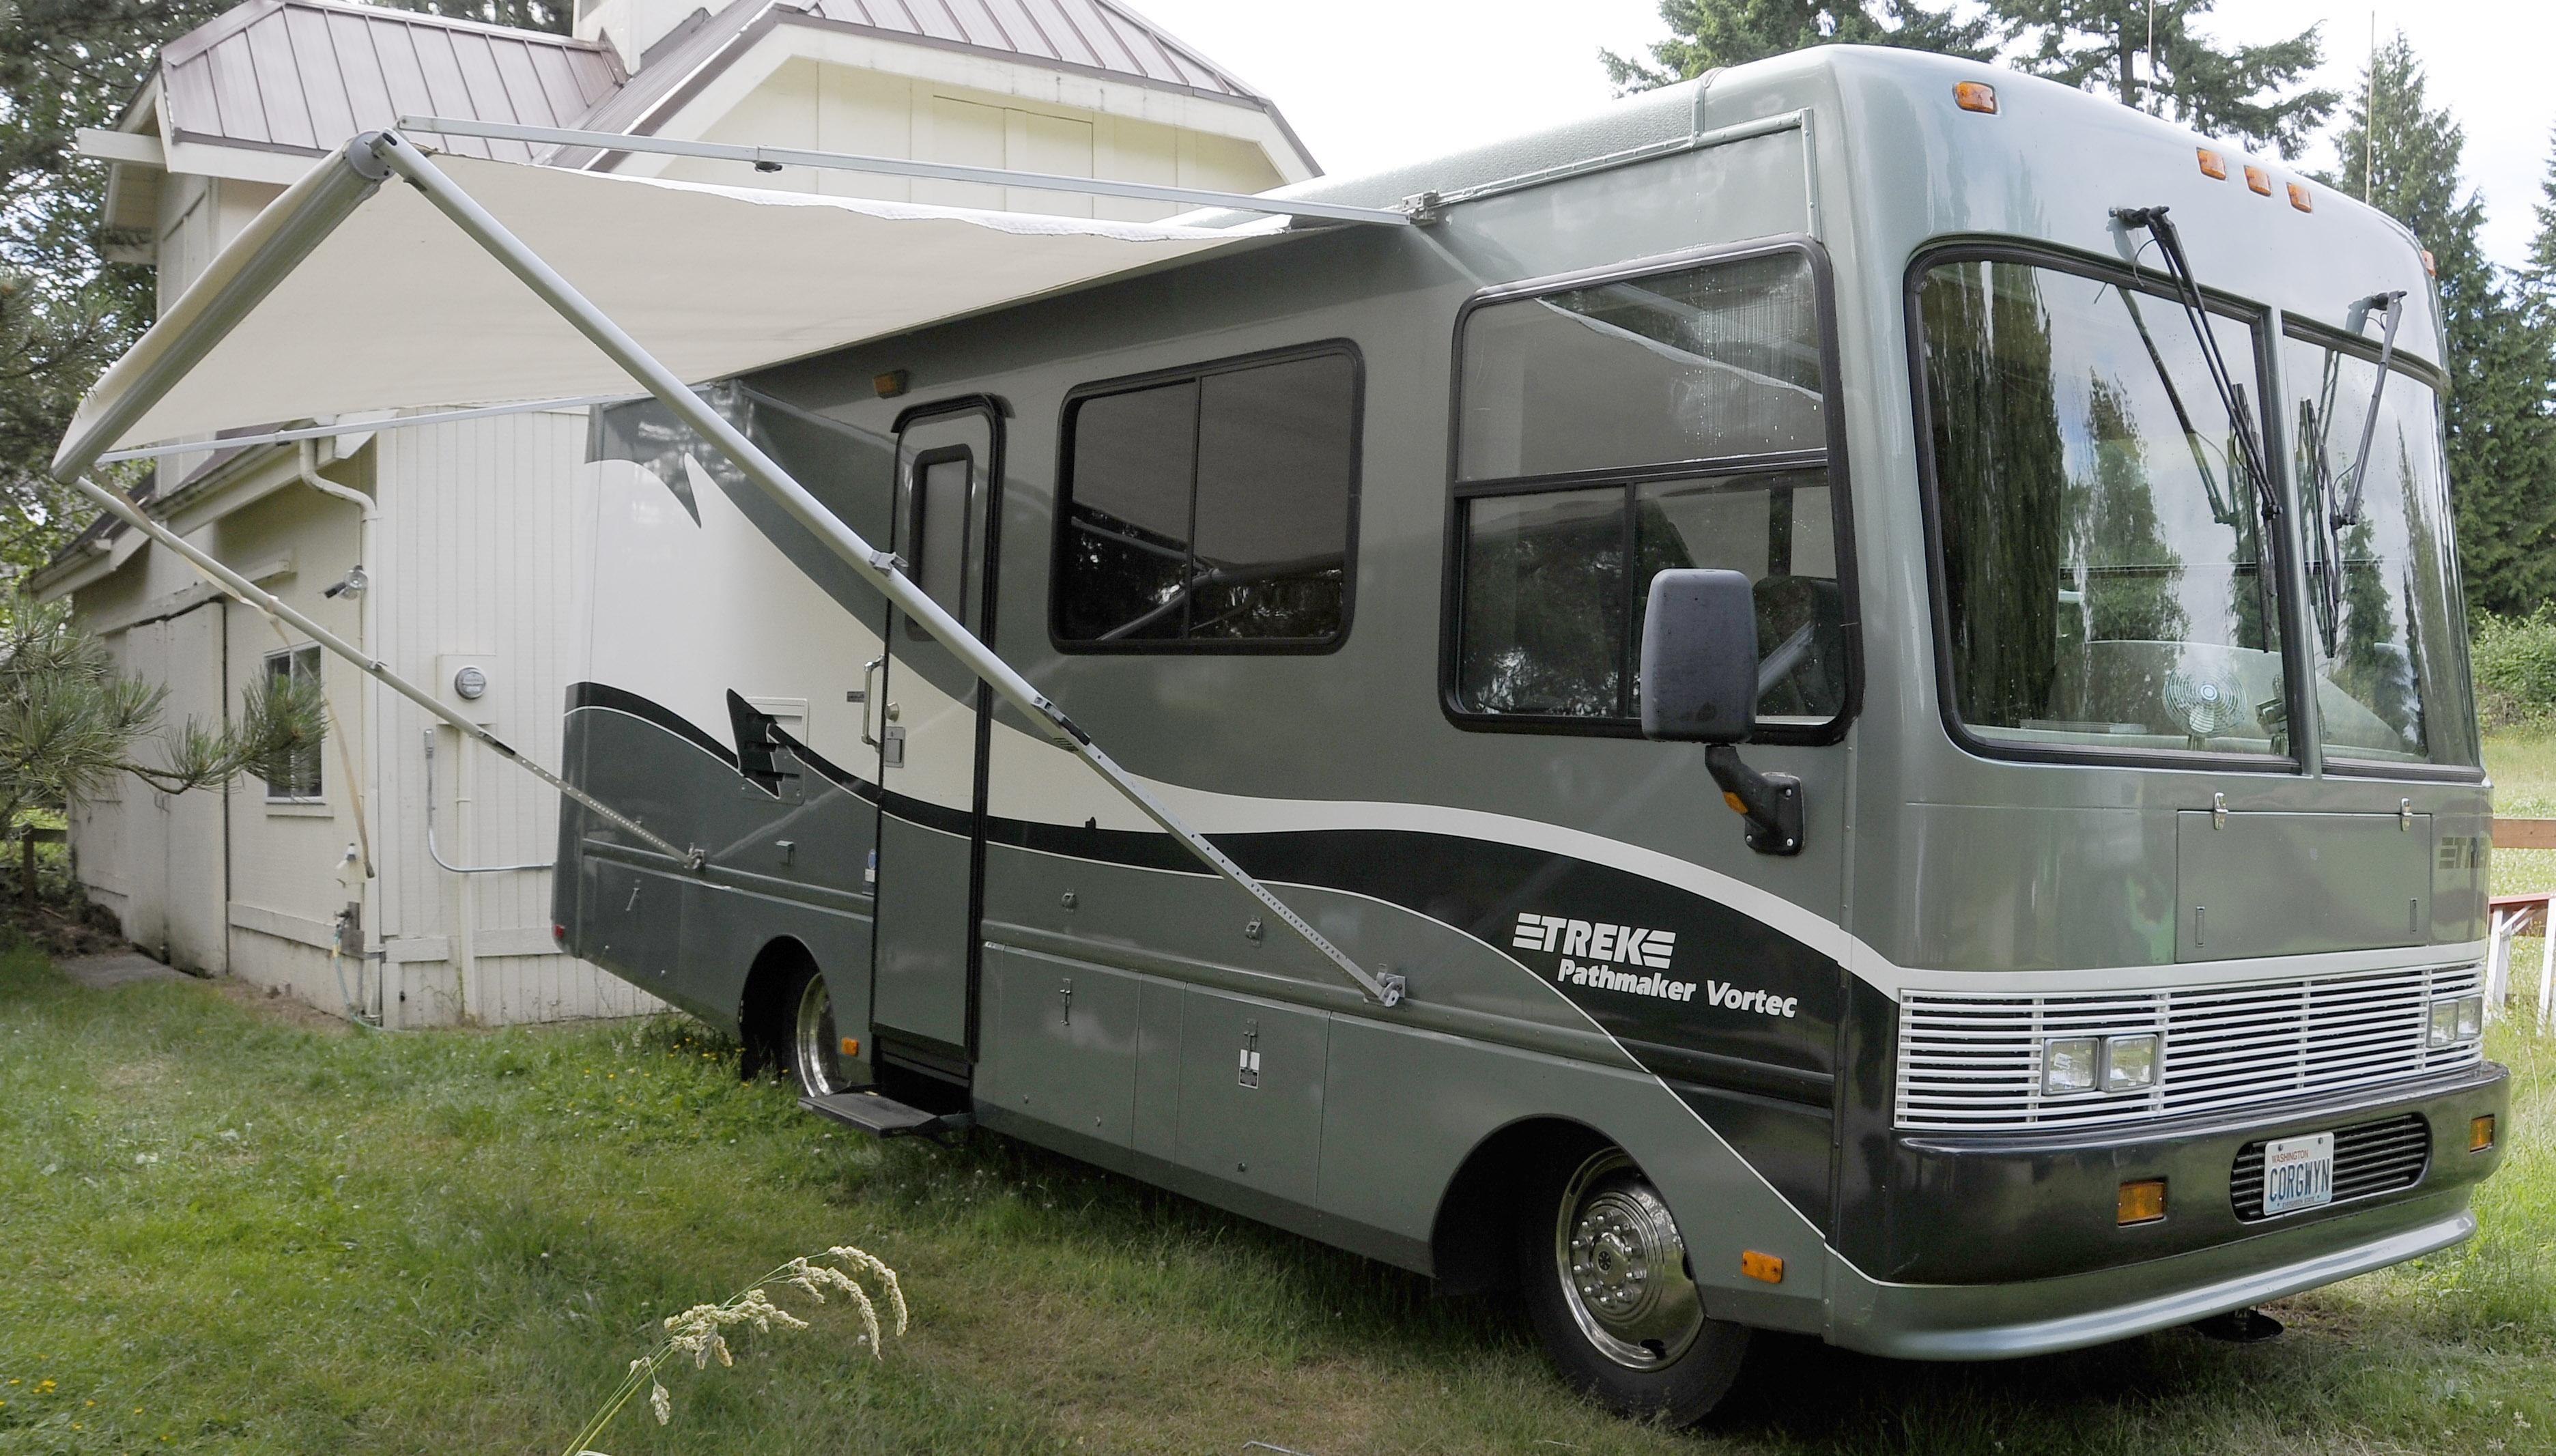 Leo & Kathy's Place: For Sale: 1999 Safari Trek 26' Gas RV